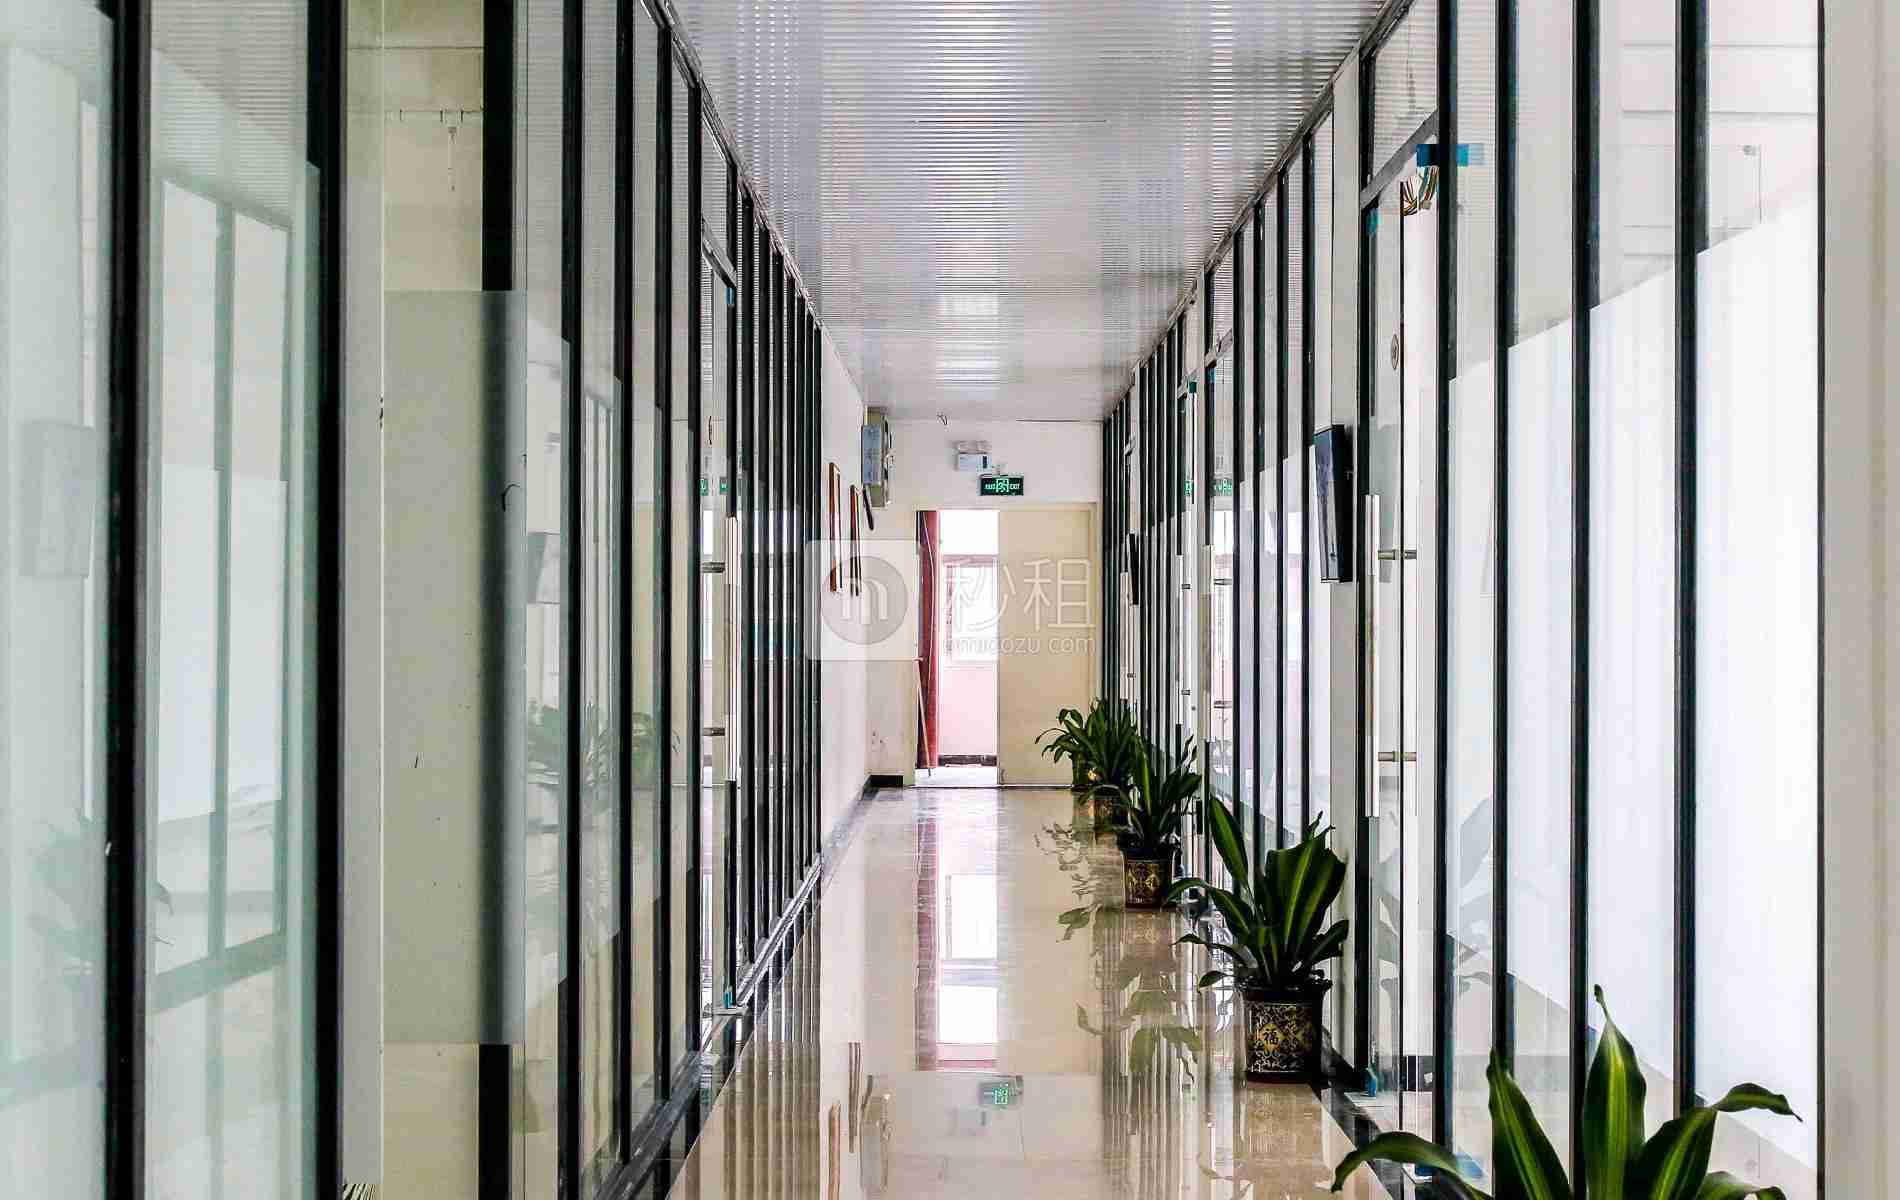 GOGO KTV三楼写字楼出租/招租/租赁,GOGO KTV三楼办公室出租/招租/租赁